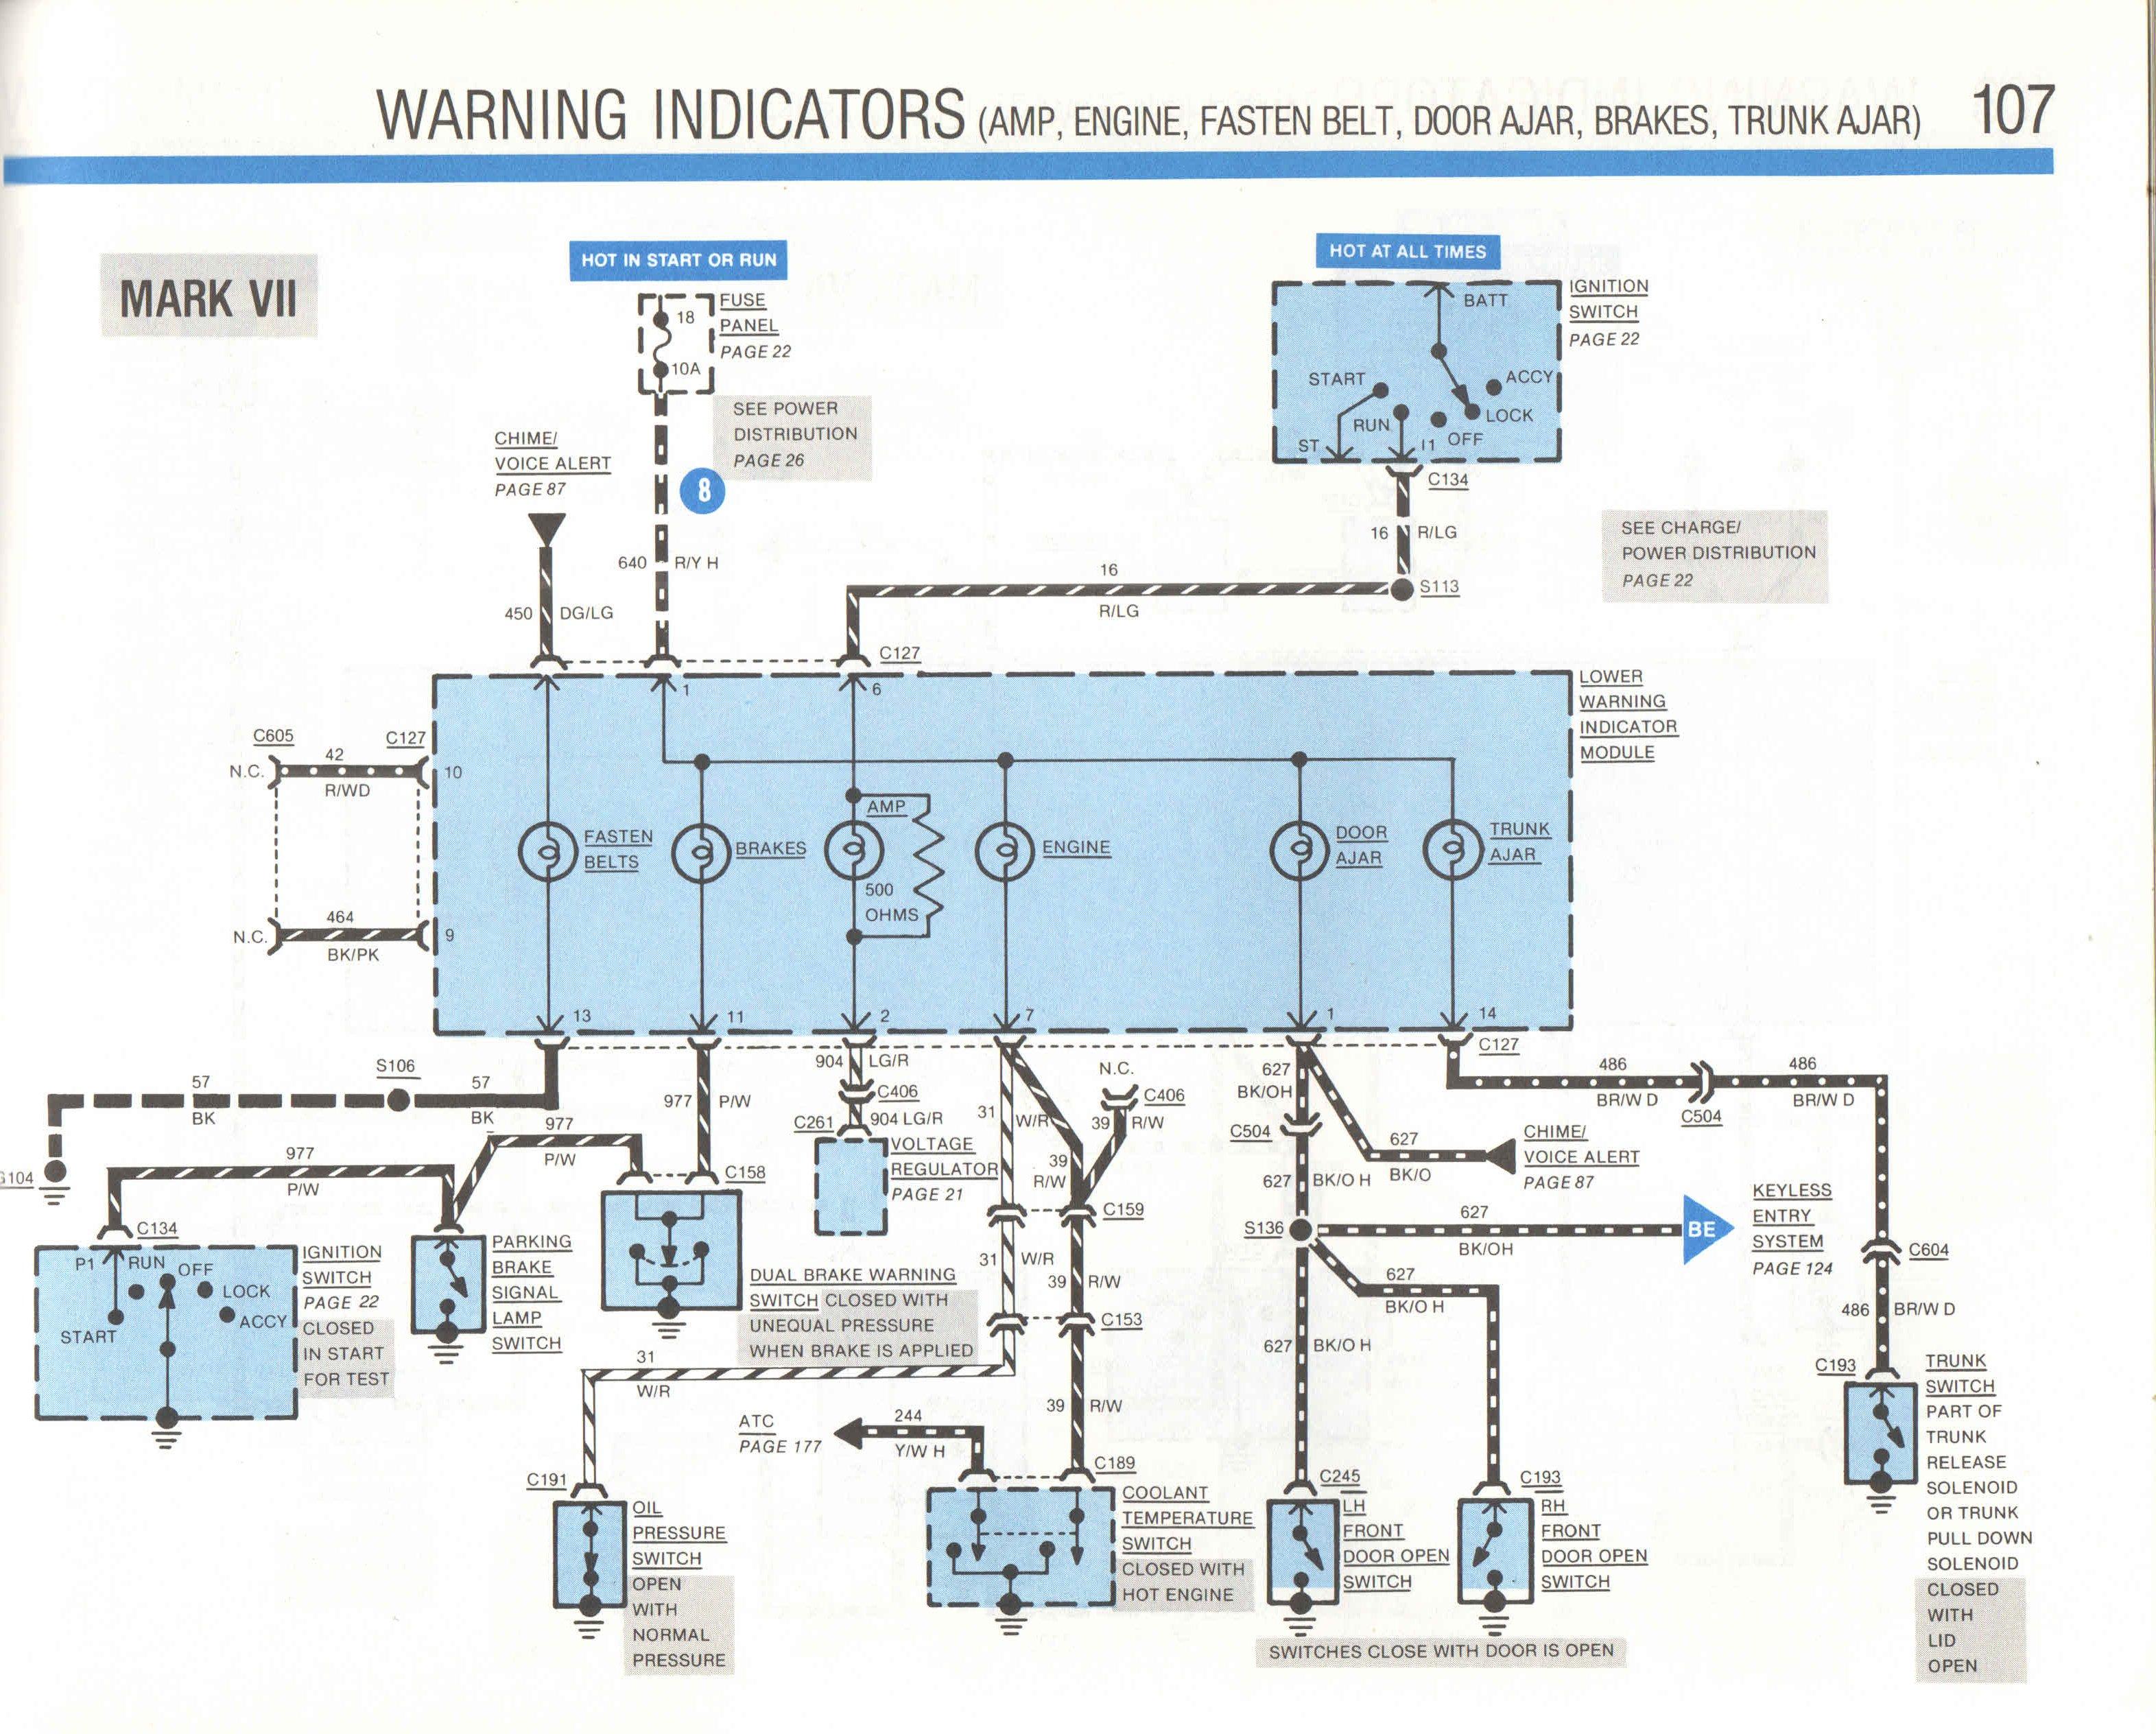 Miraculous 1989 Lincoln Mark Vii Fuse Box Diagram Wiring Diagram Wiring Cloud Dulfrecoveryedborg